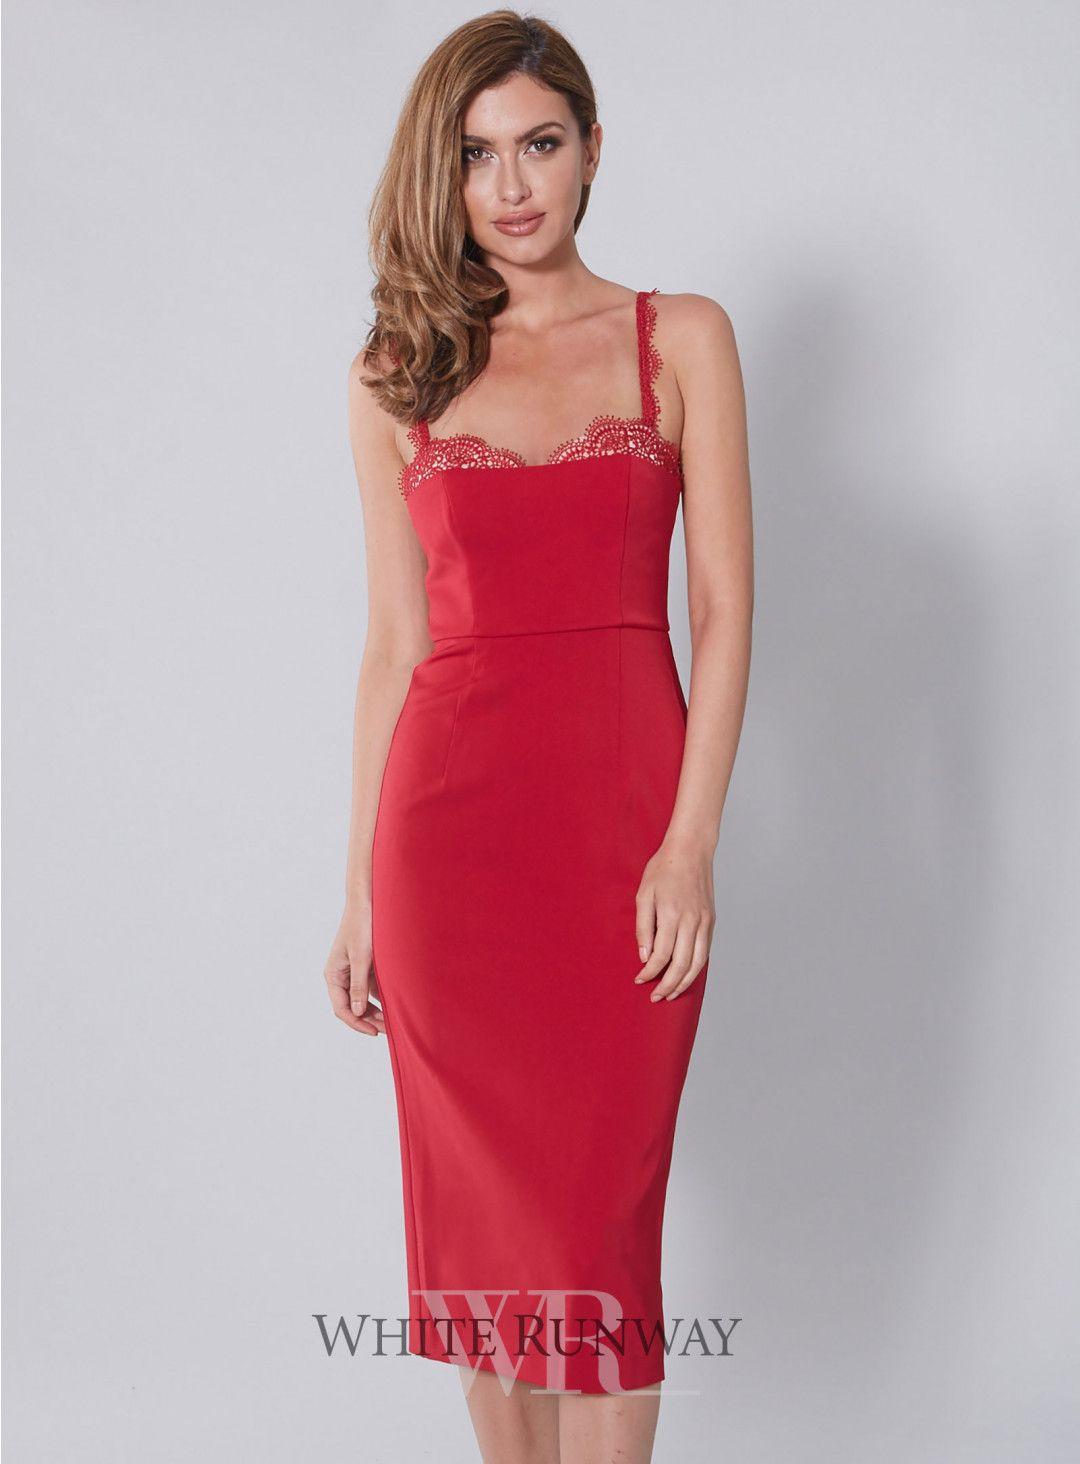 Dena Cocktail Dress Cocktail Dress Dresses Red Bridesmaids [ 1464 x 1080 Pixel ]